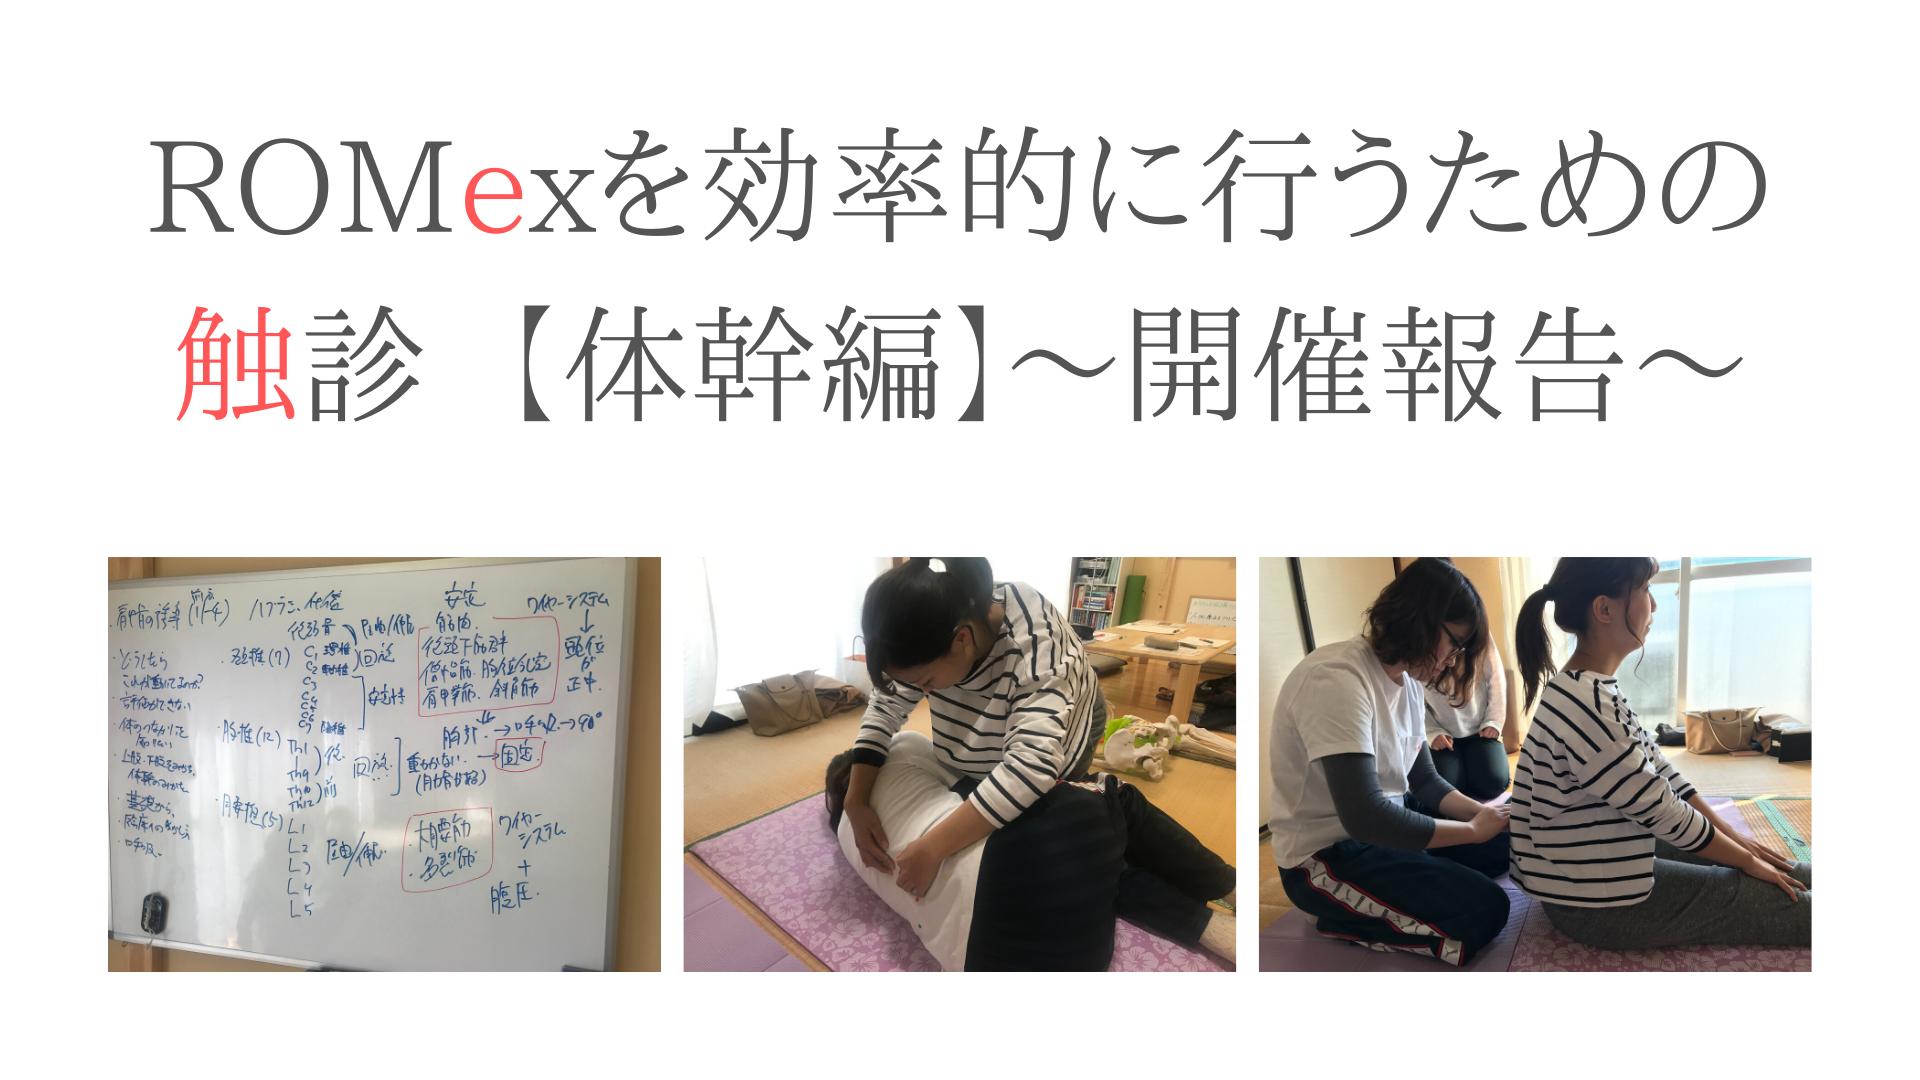 ROMexを効率的に行うための触診【体幹編】〜開催報告〜